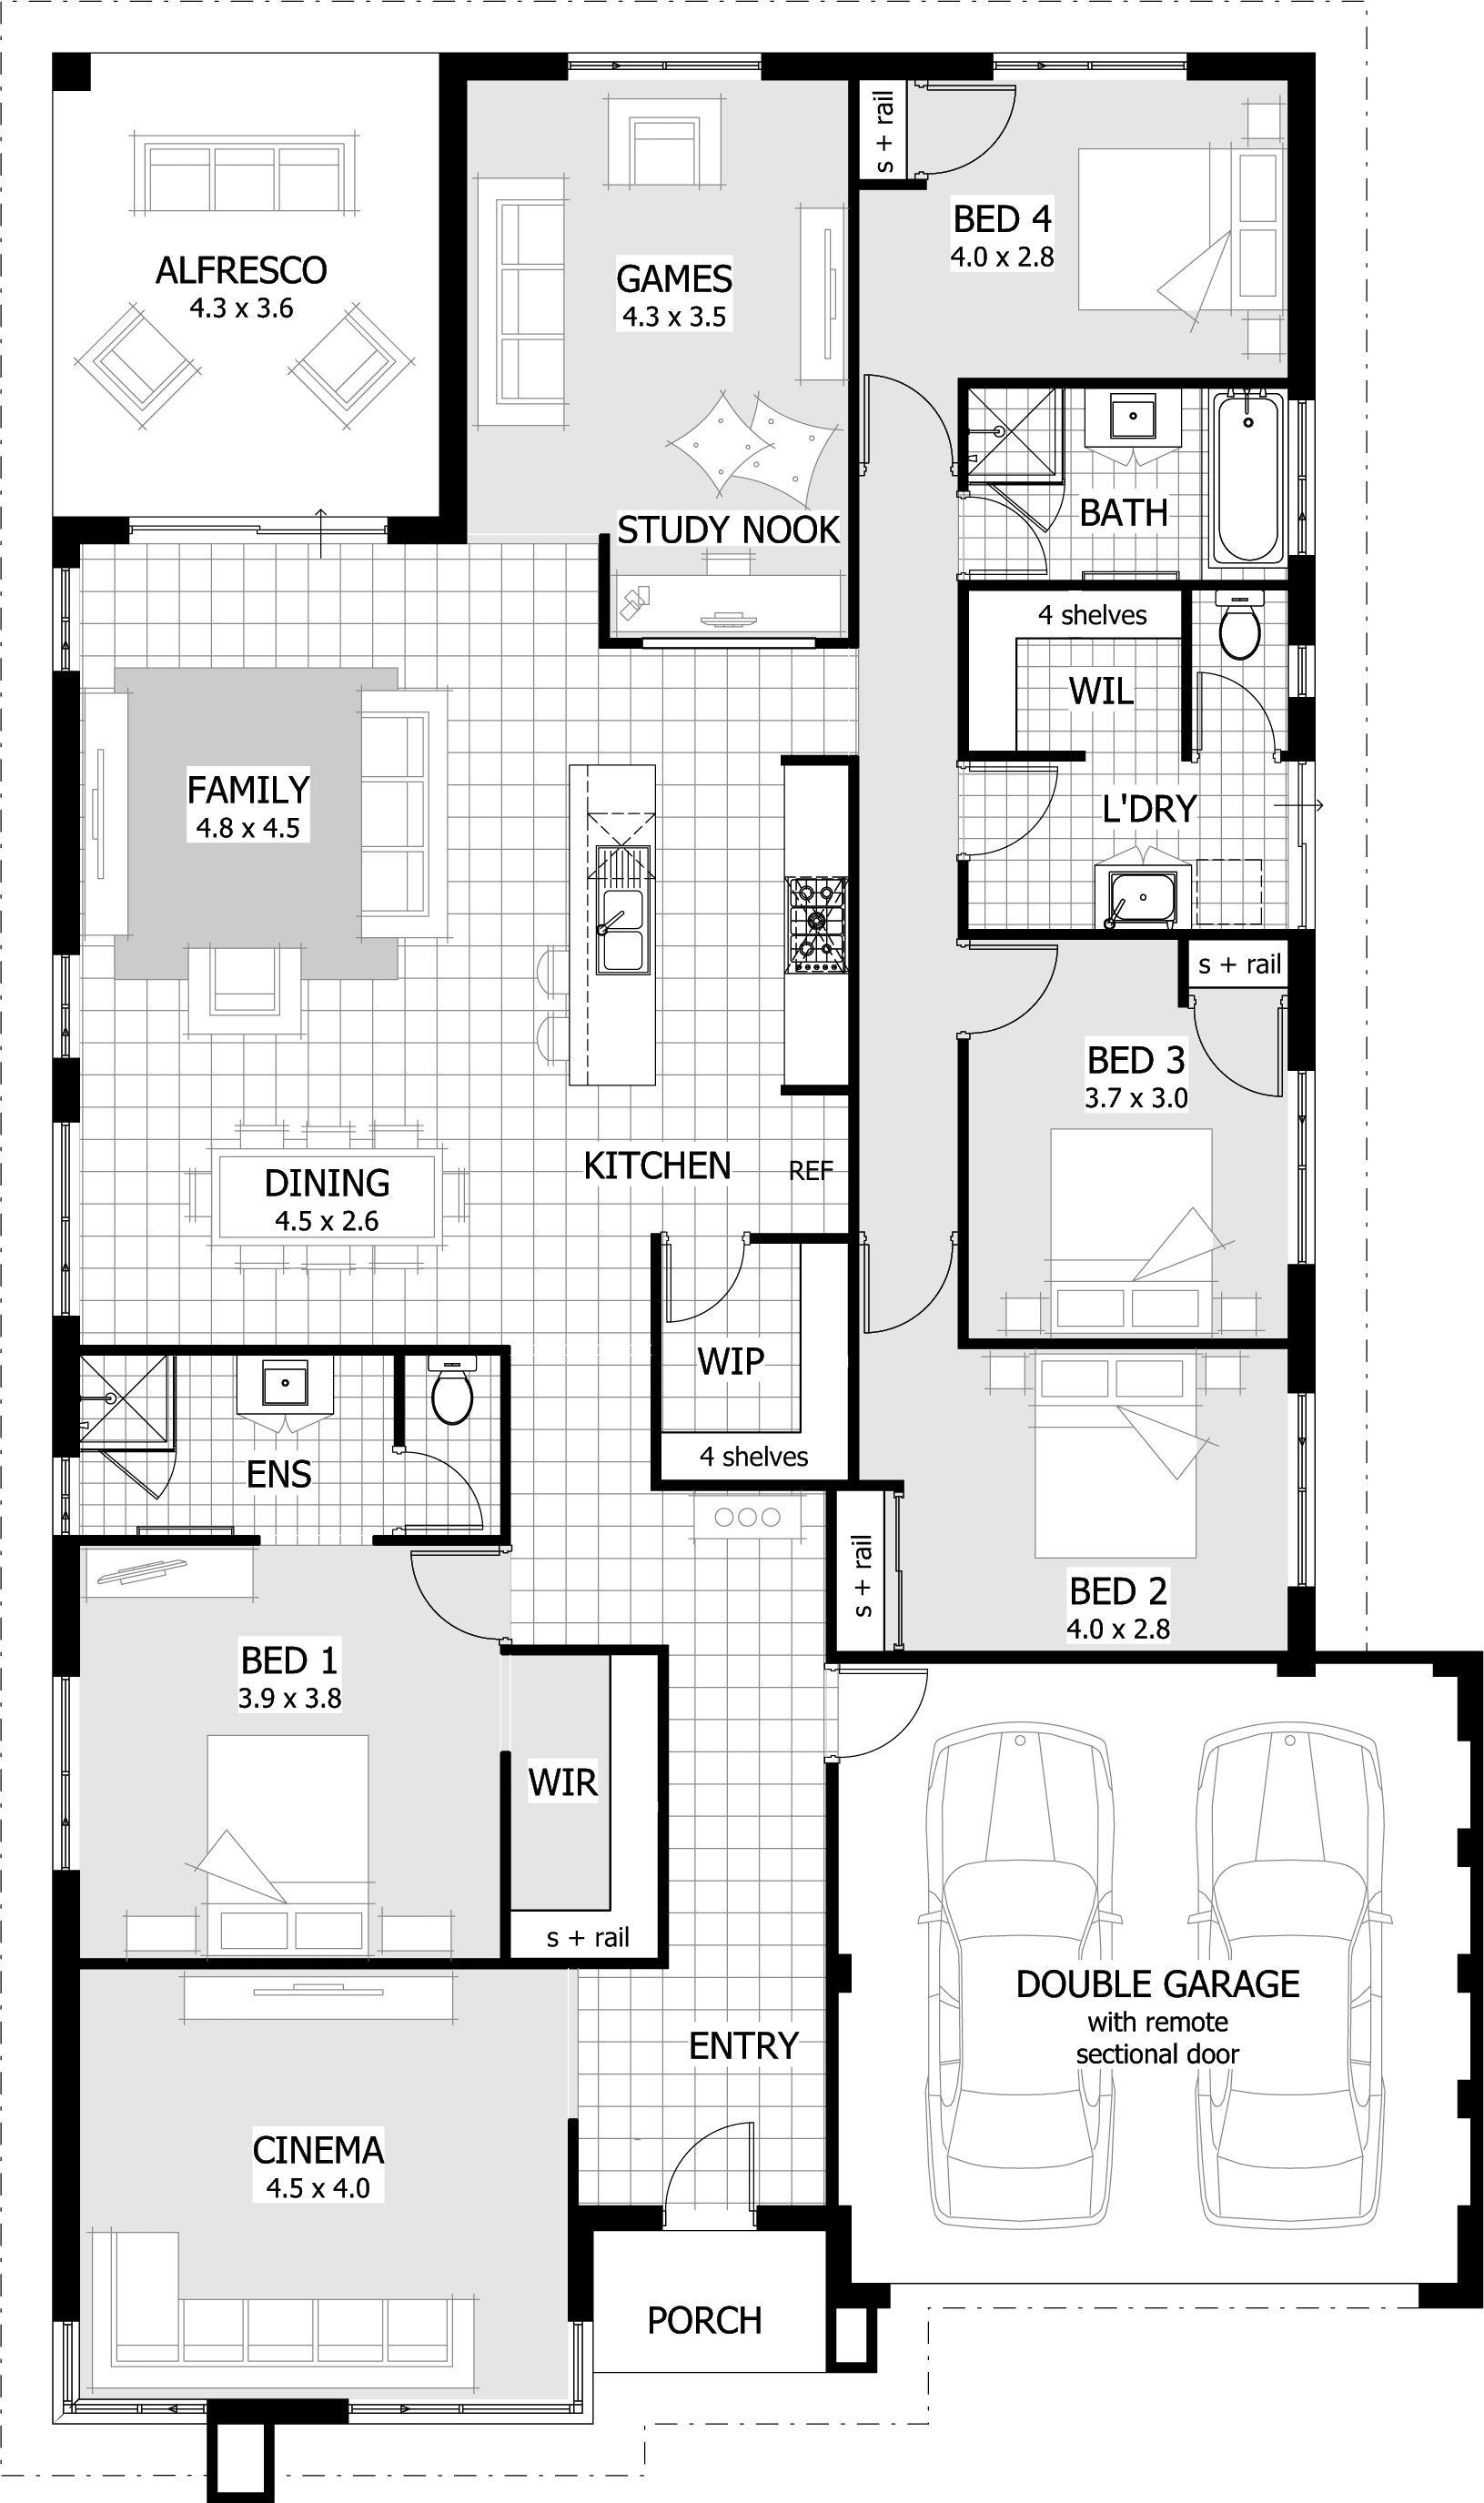 Home Designs Celebration Homes Small Villa Home Design Floor Plans New House Plans